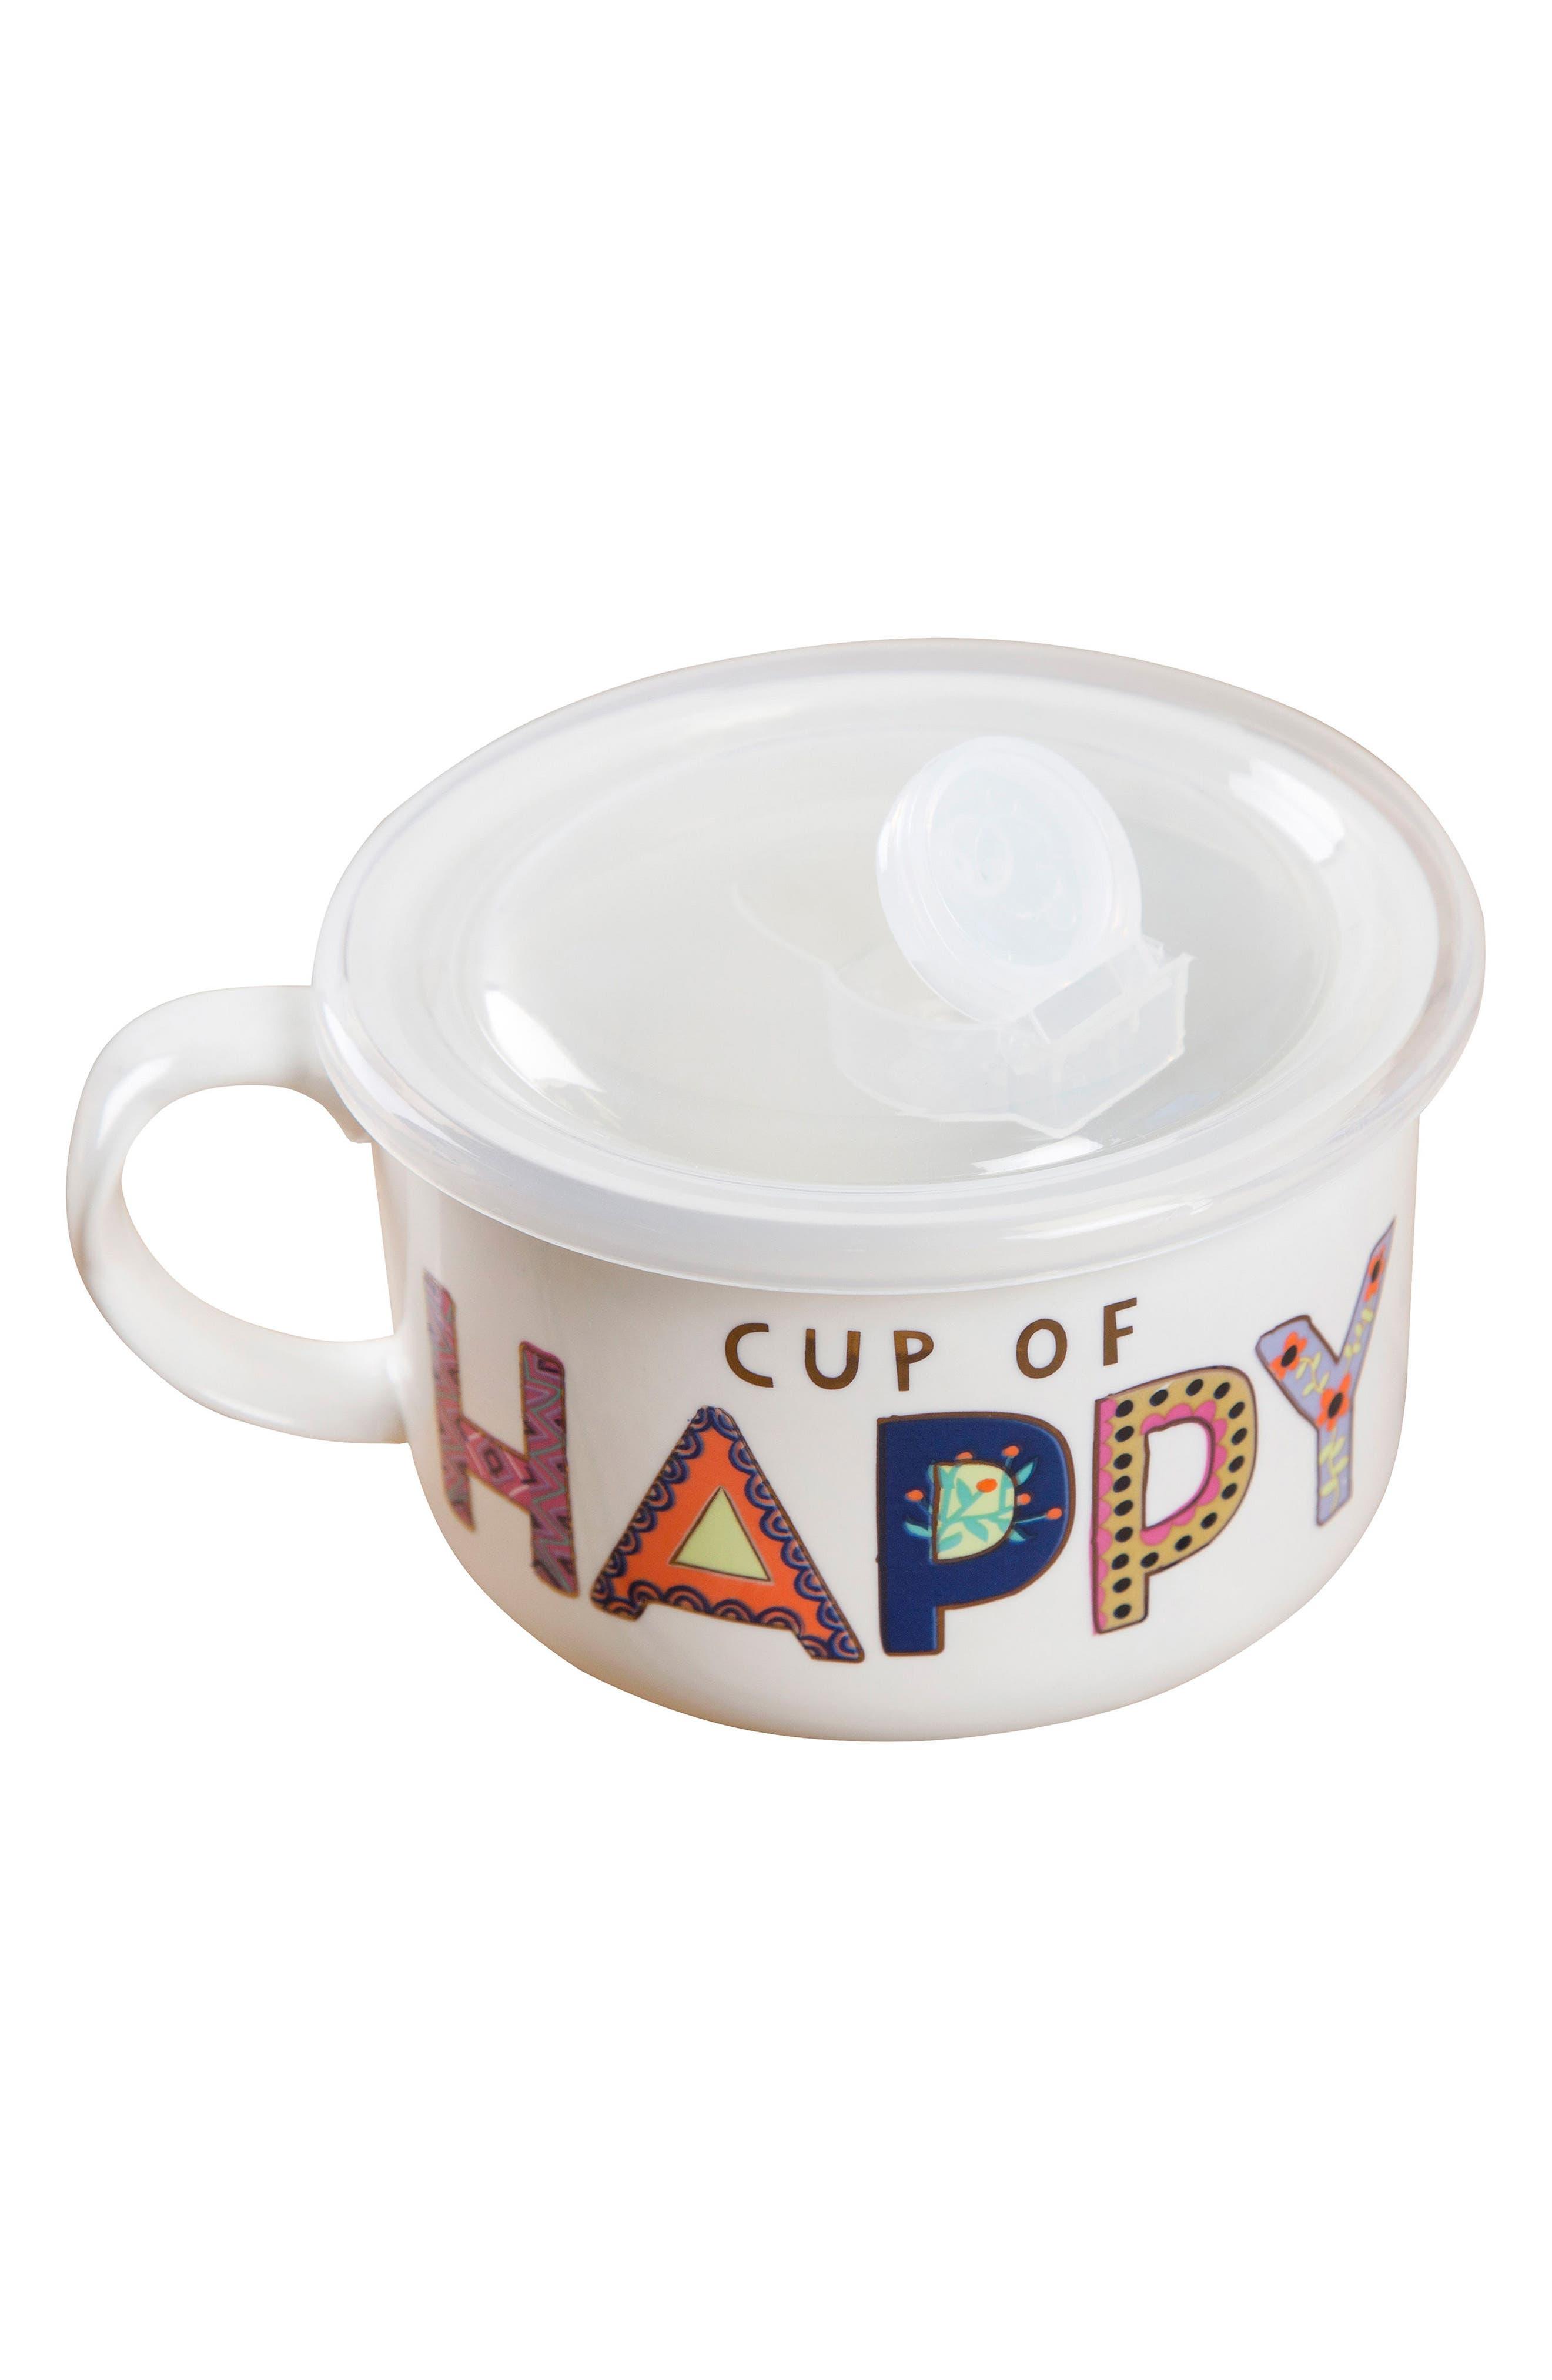 Cup of Happy Lidded Ceramic Soup Mug,                             Main thumbnail 1, color,                             906